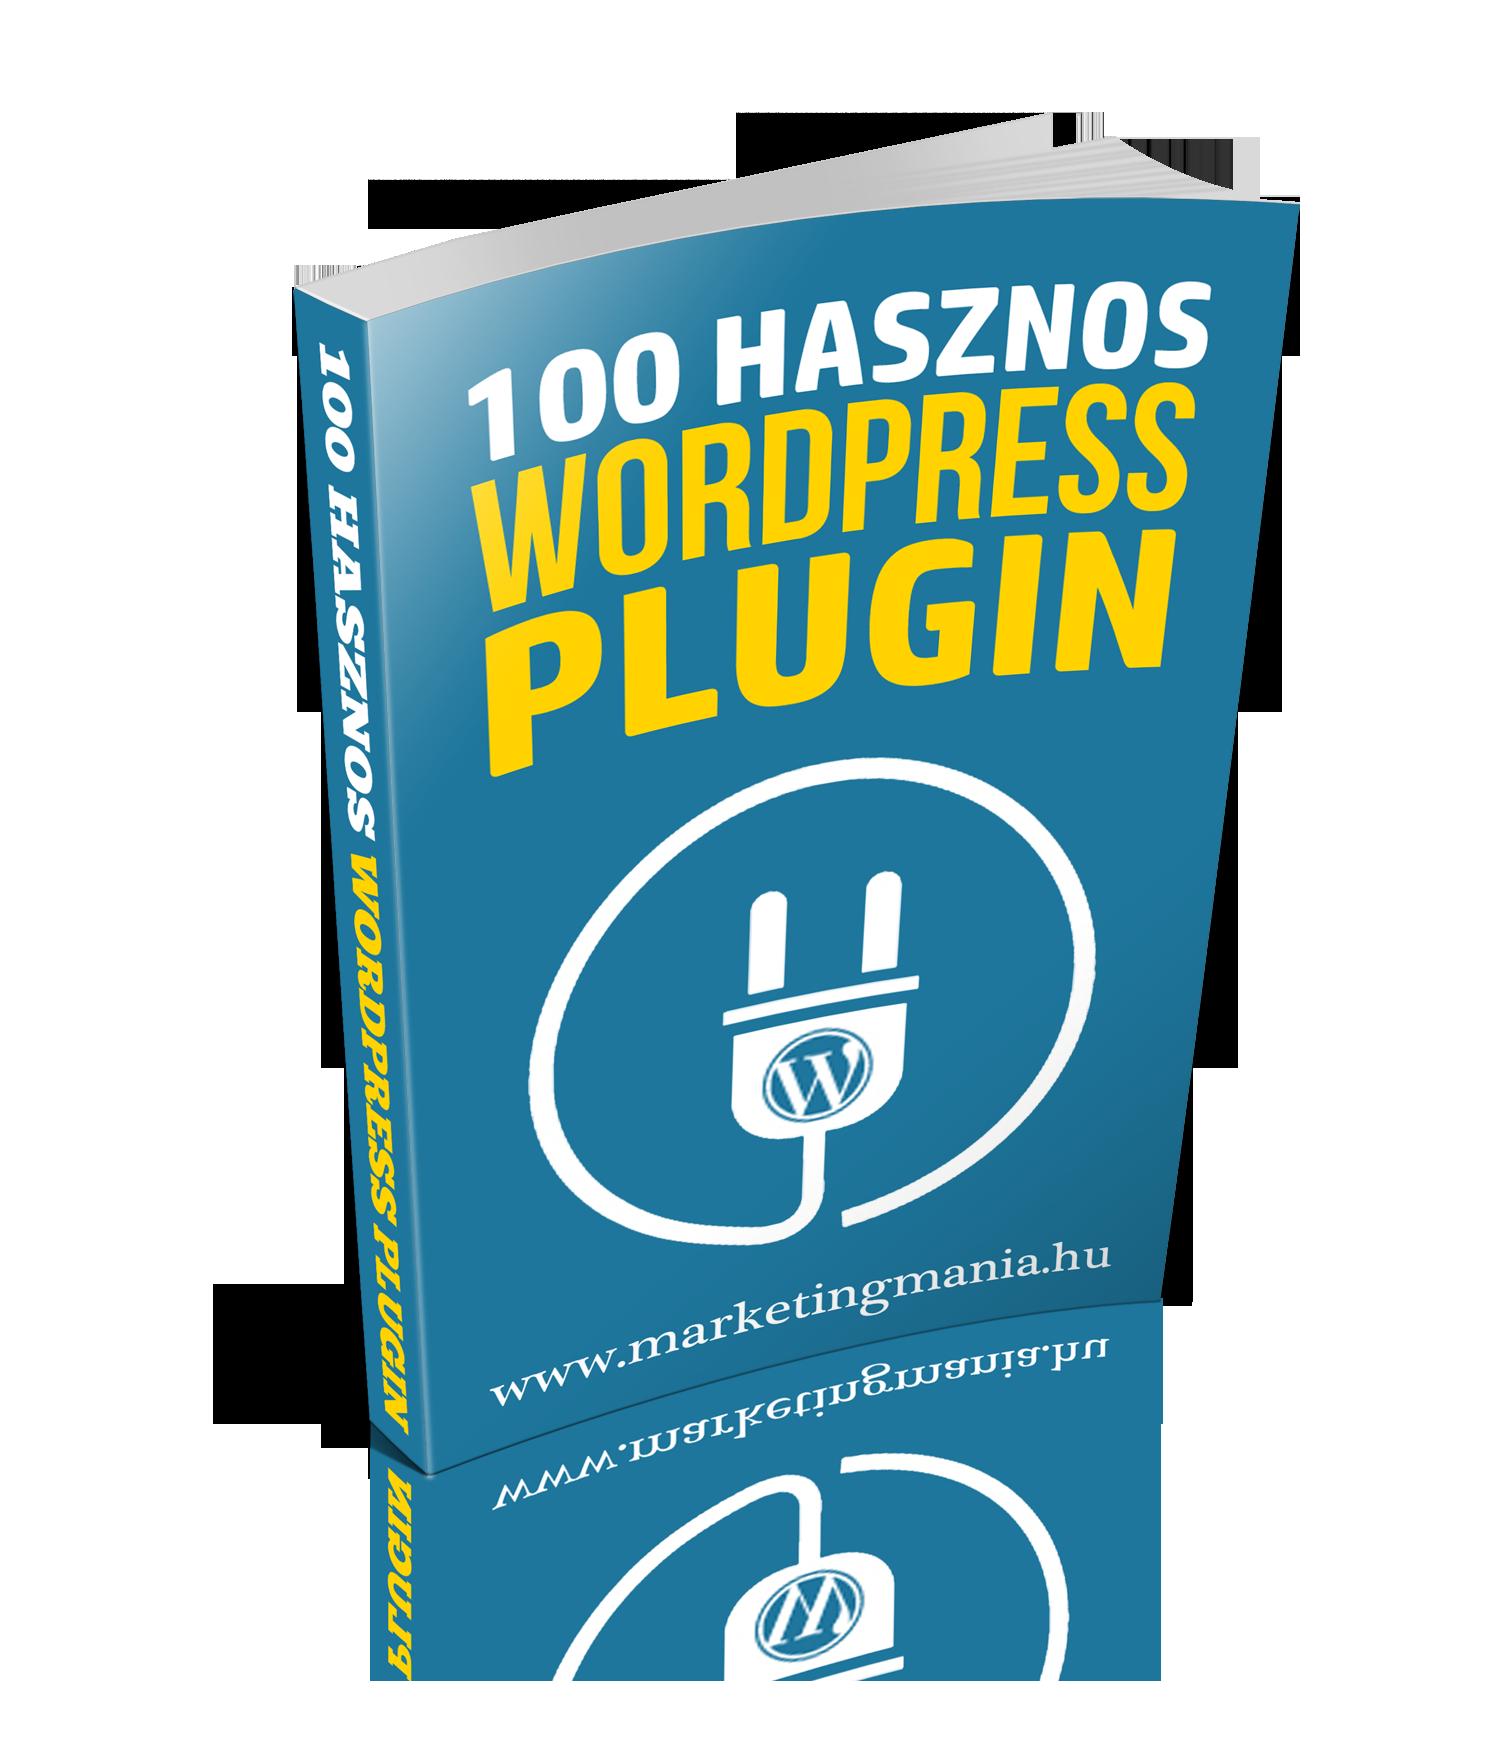 100 hasznos WordPress plugin